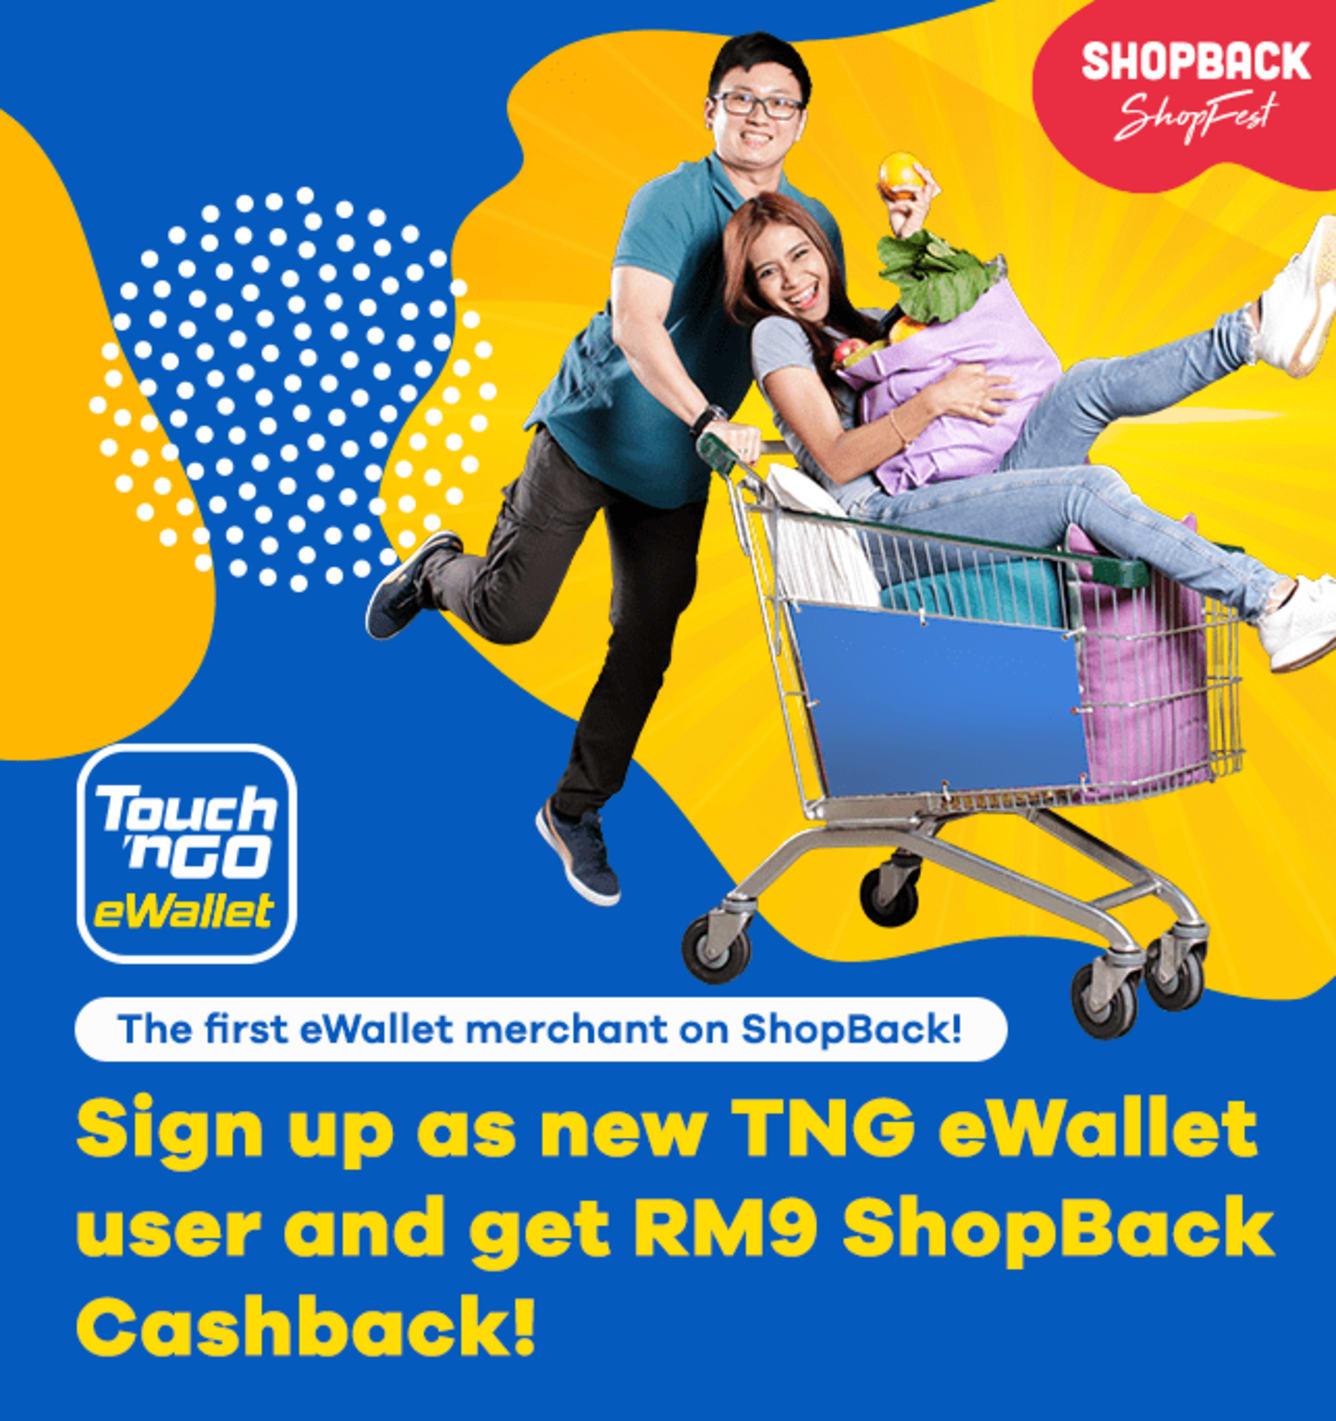 TnG 100% Cashback